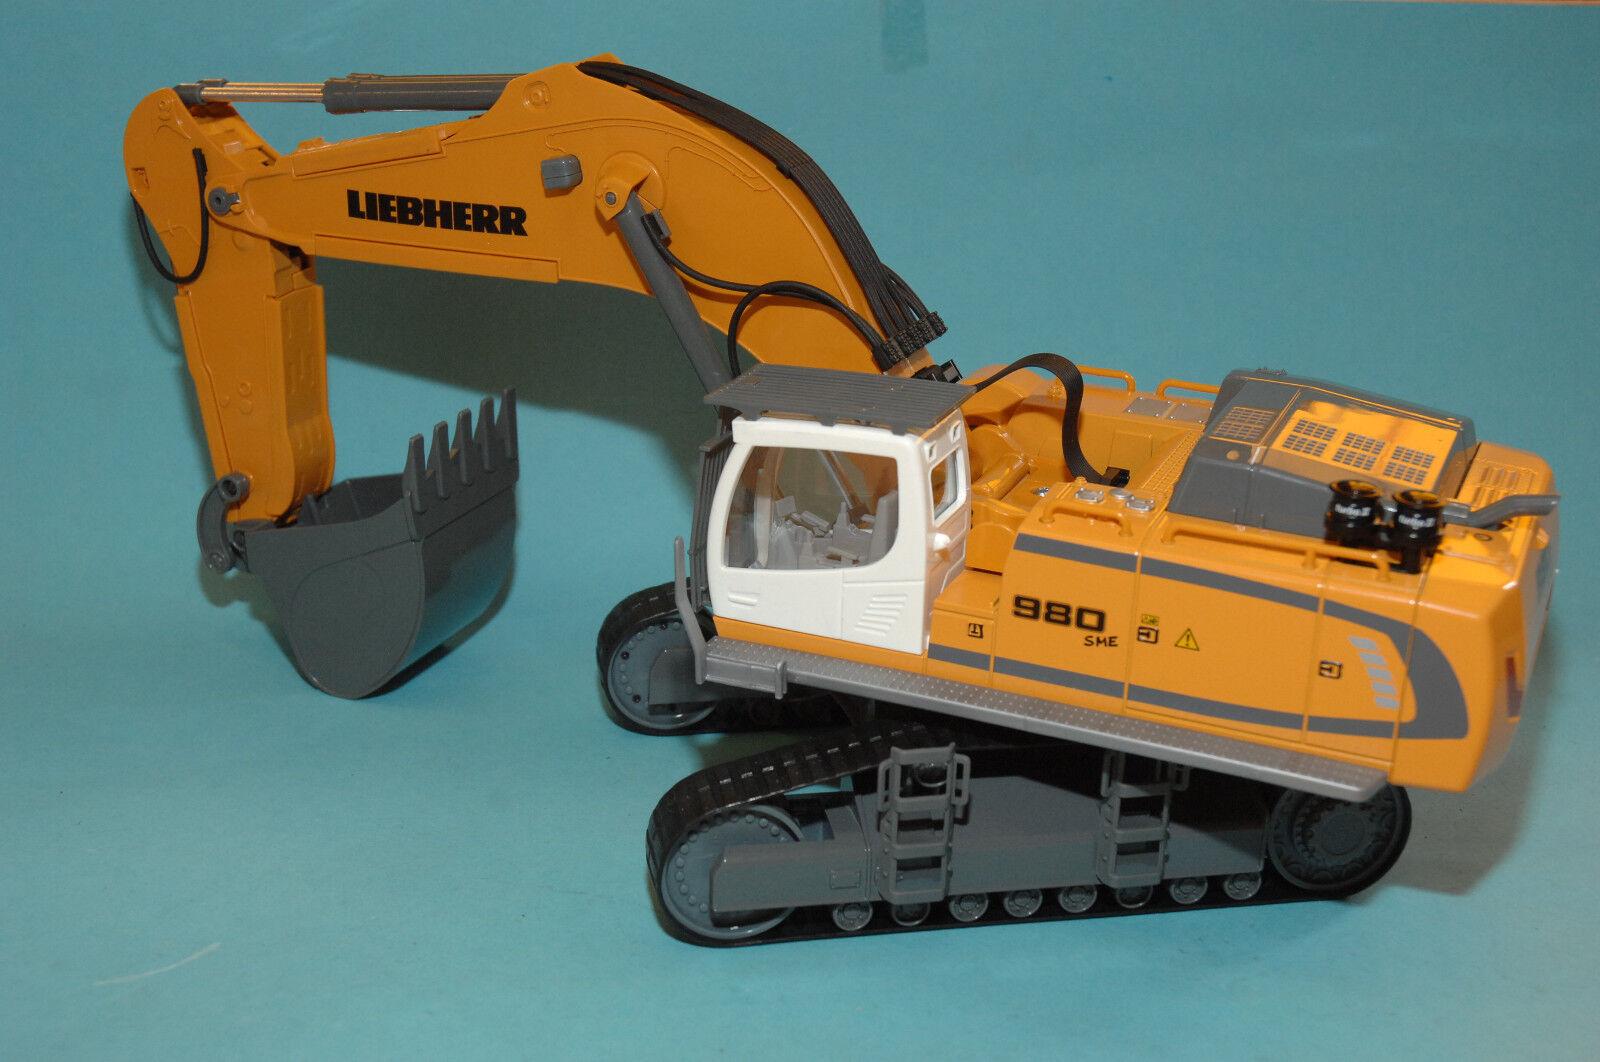 SIKU Control32 6740 LIEBHERR R980 SME Crawler excavator RC Model 1 32 NEW